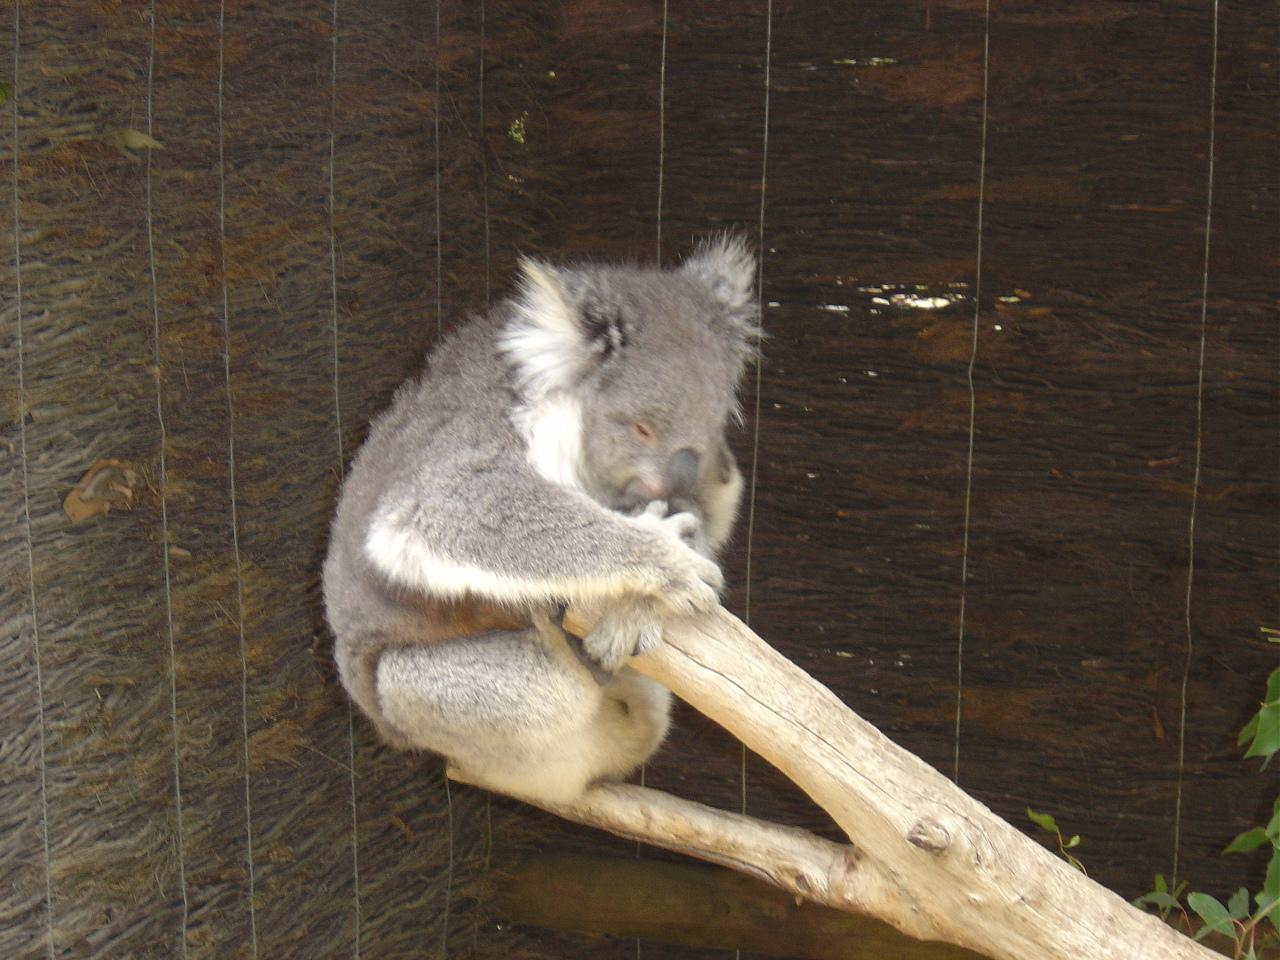 images ballarat wildlife - photo #2